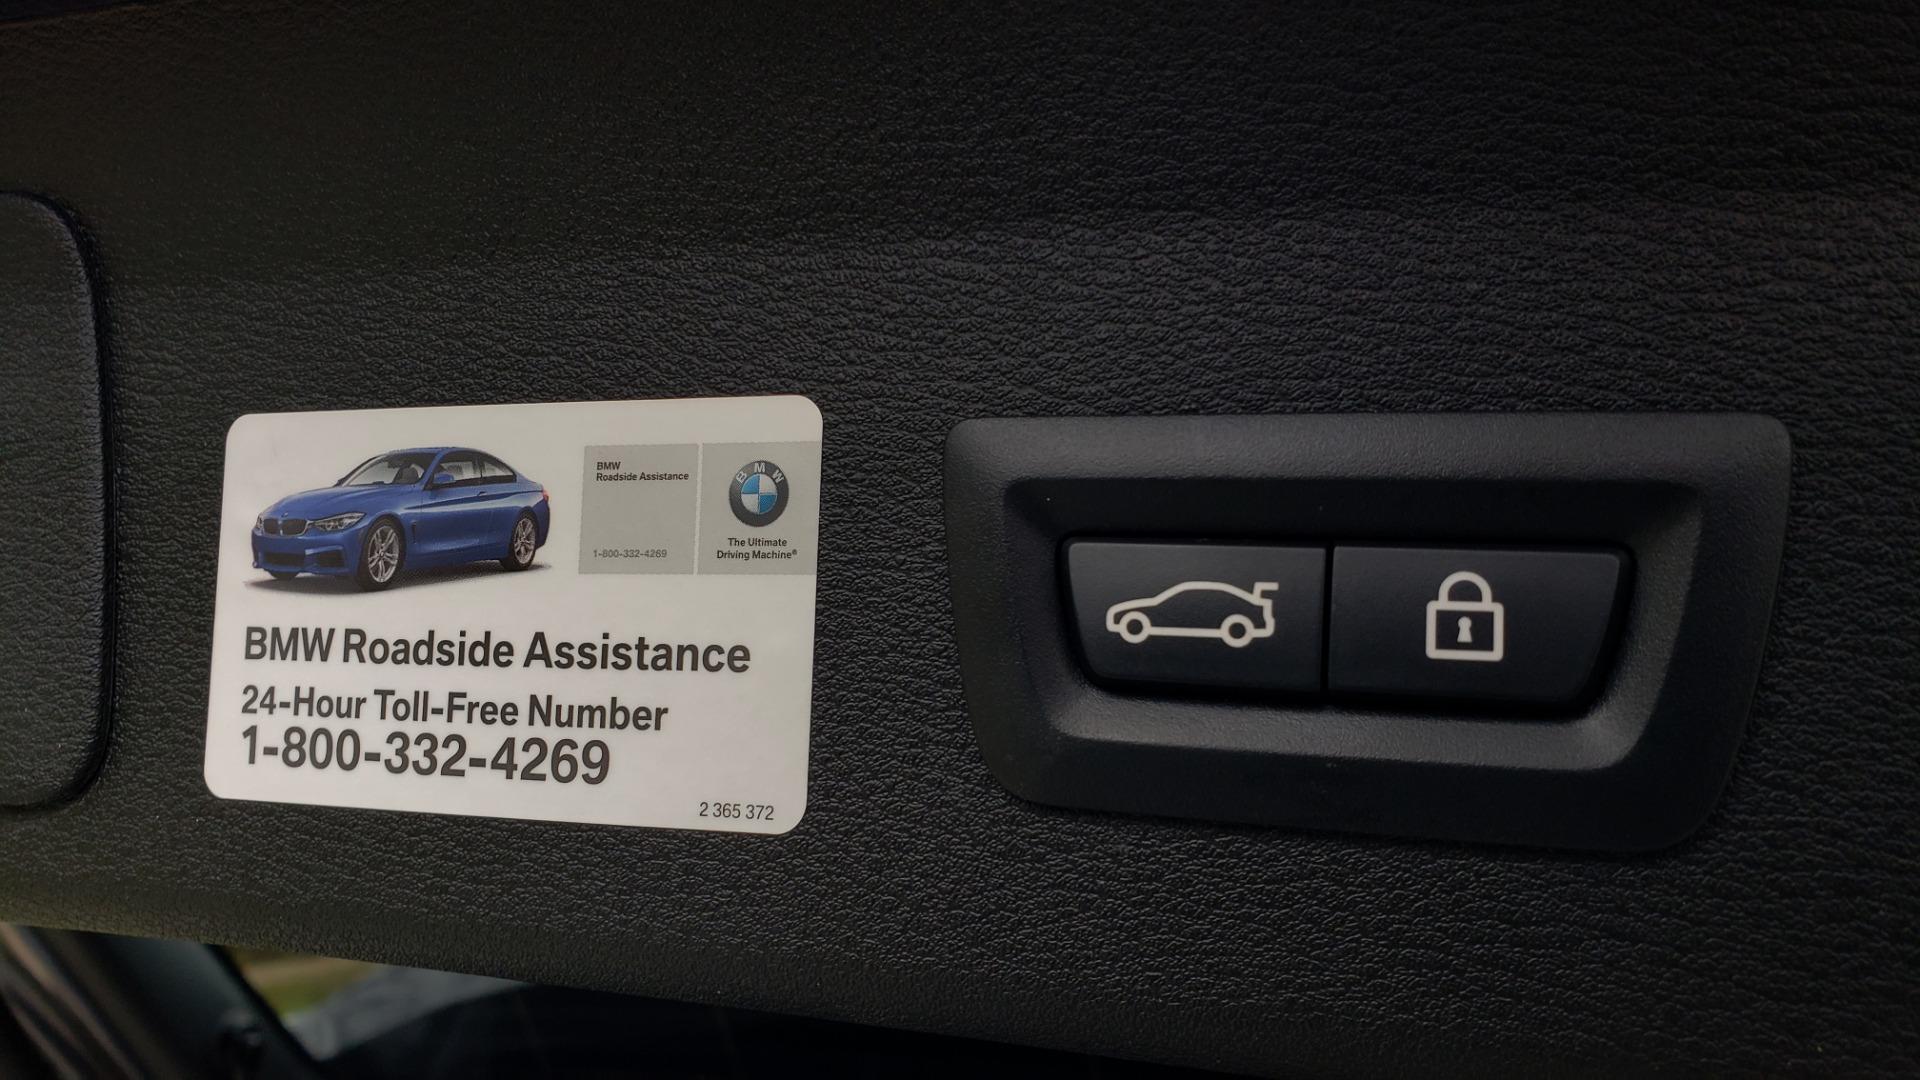 Used 2017 BMW X1 XDRIVE28I / PREM PKG / DRIVER ASST / NAV / CLD WTHR for sale Sold at Formula Imports in Charlotte NC 28227 21